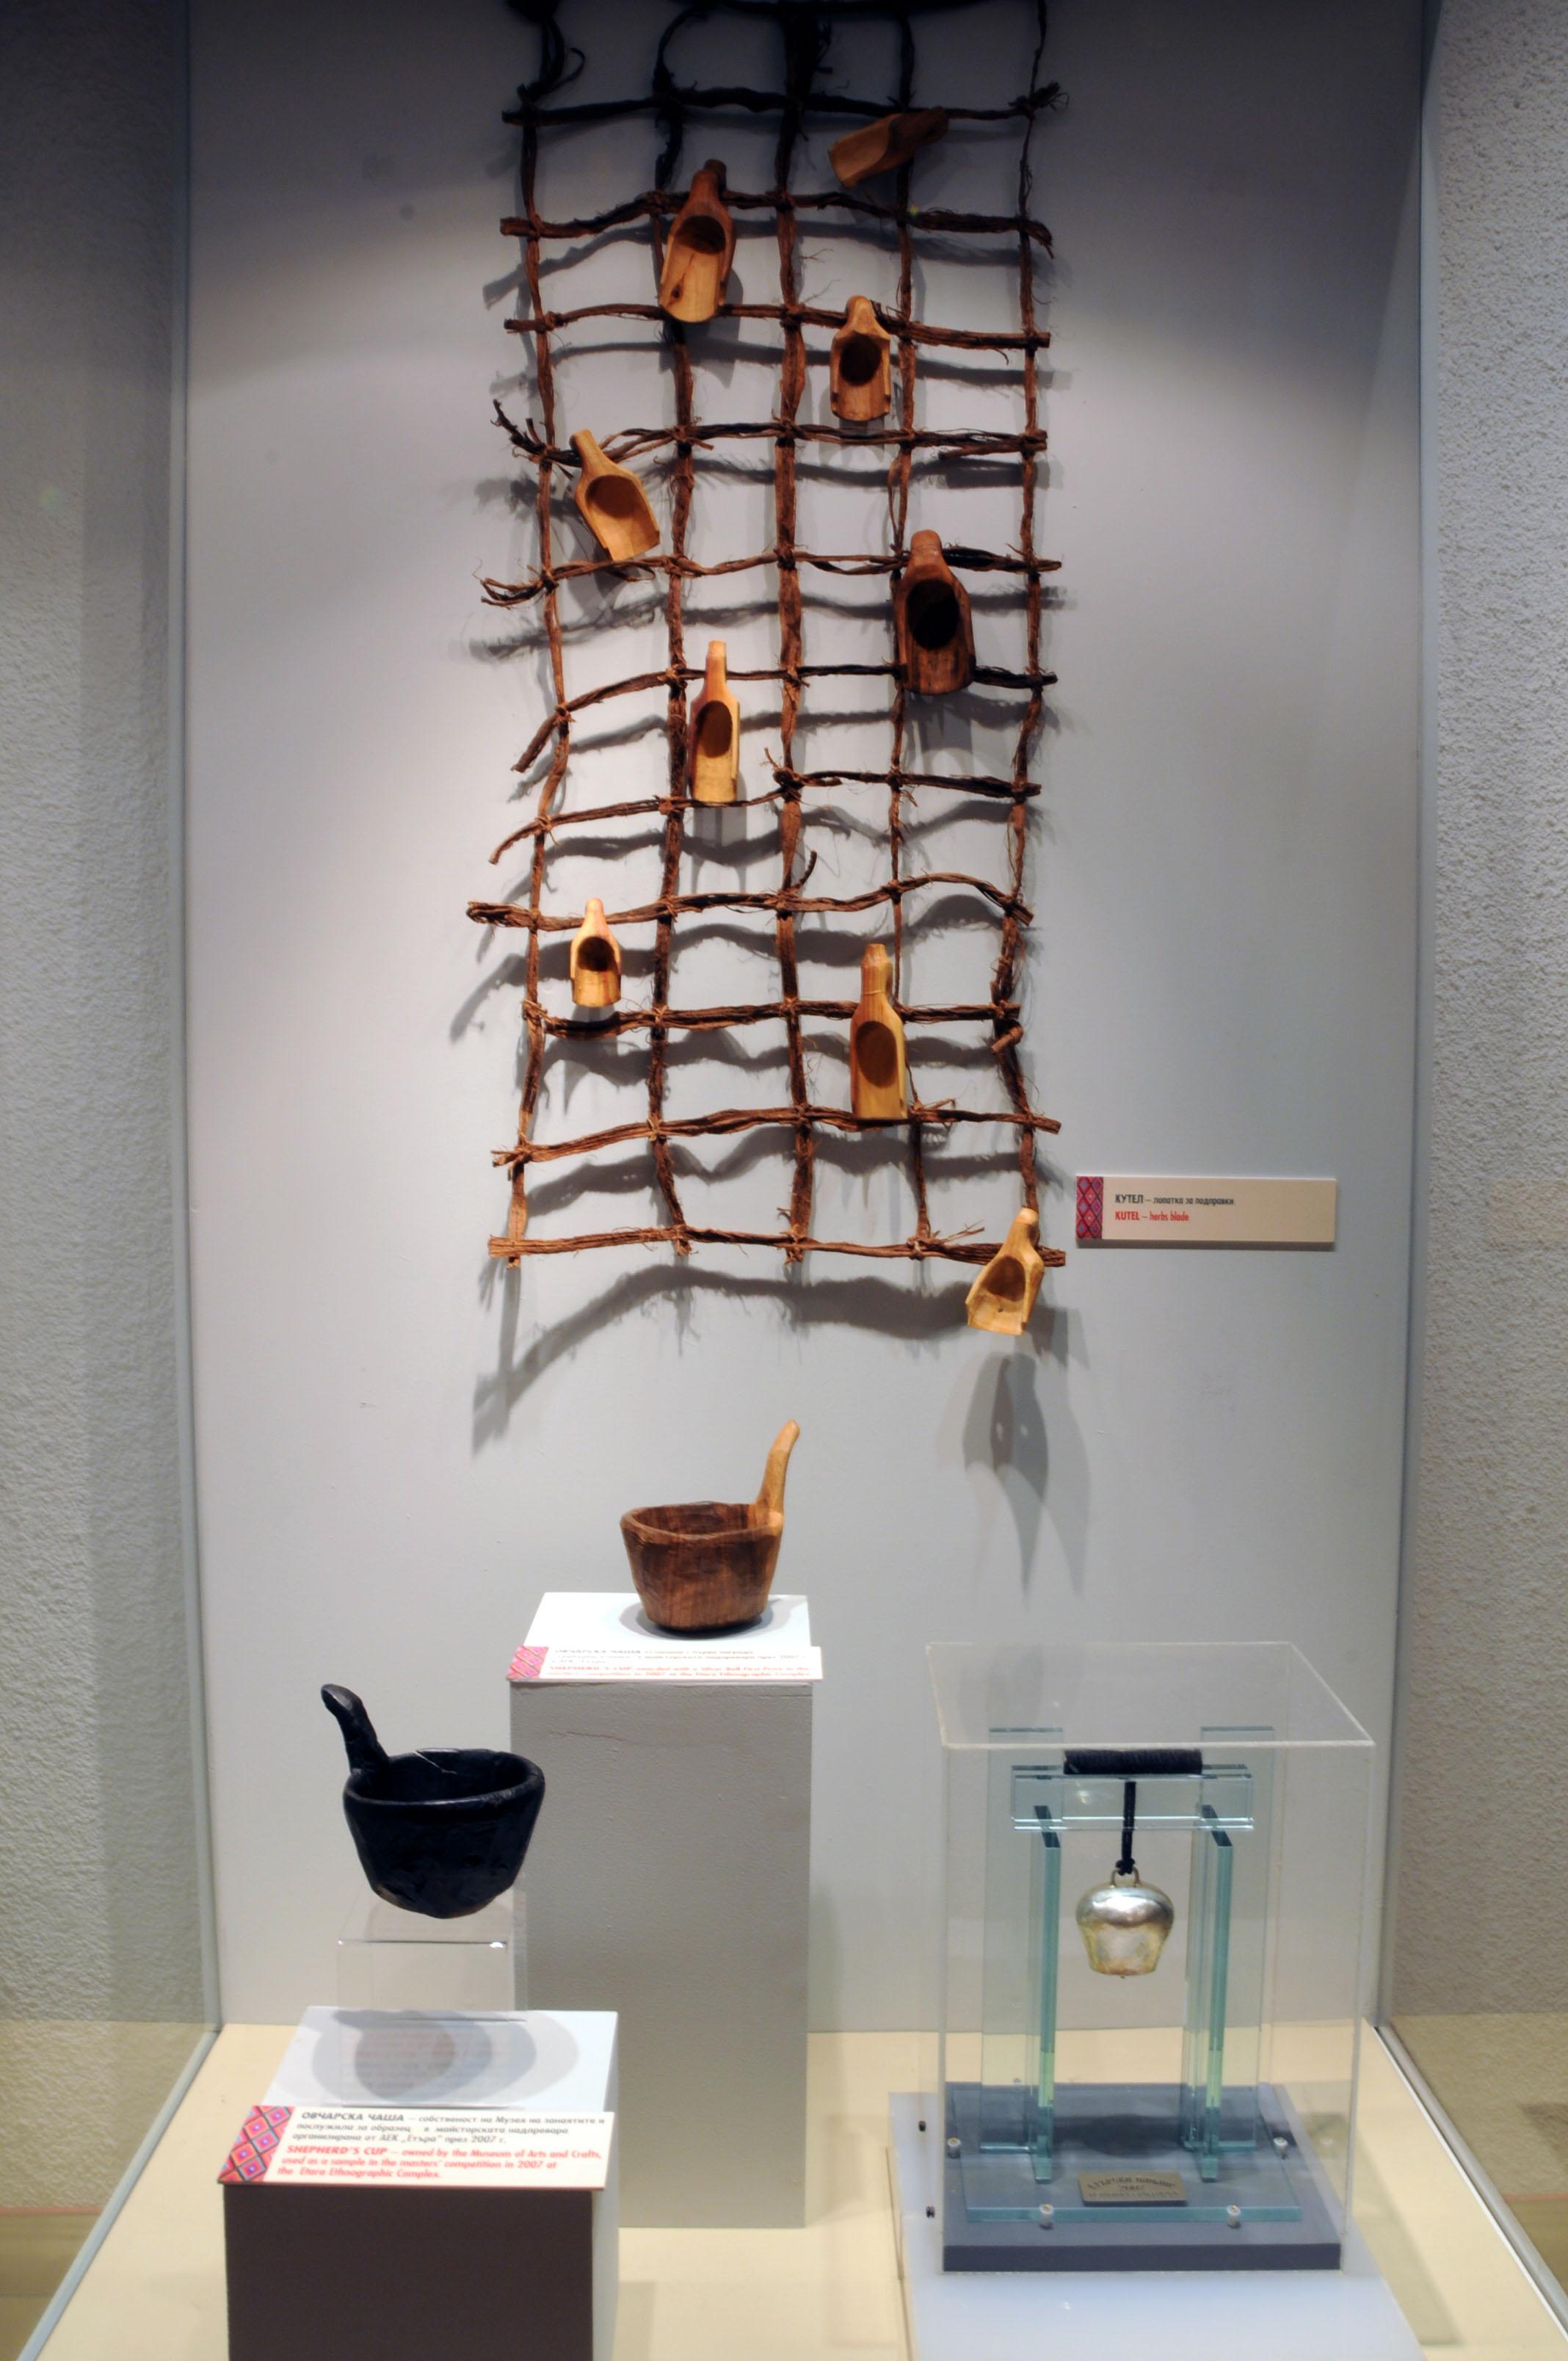 troyan-museum-kopanicharstvo-4